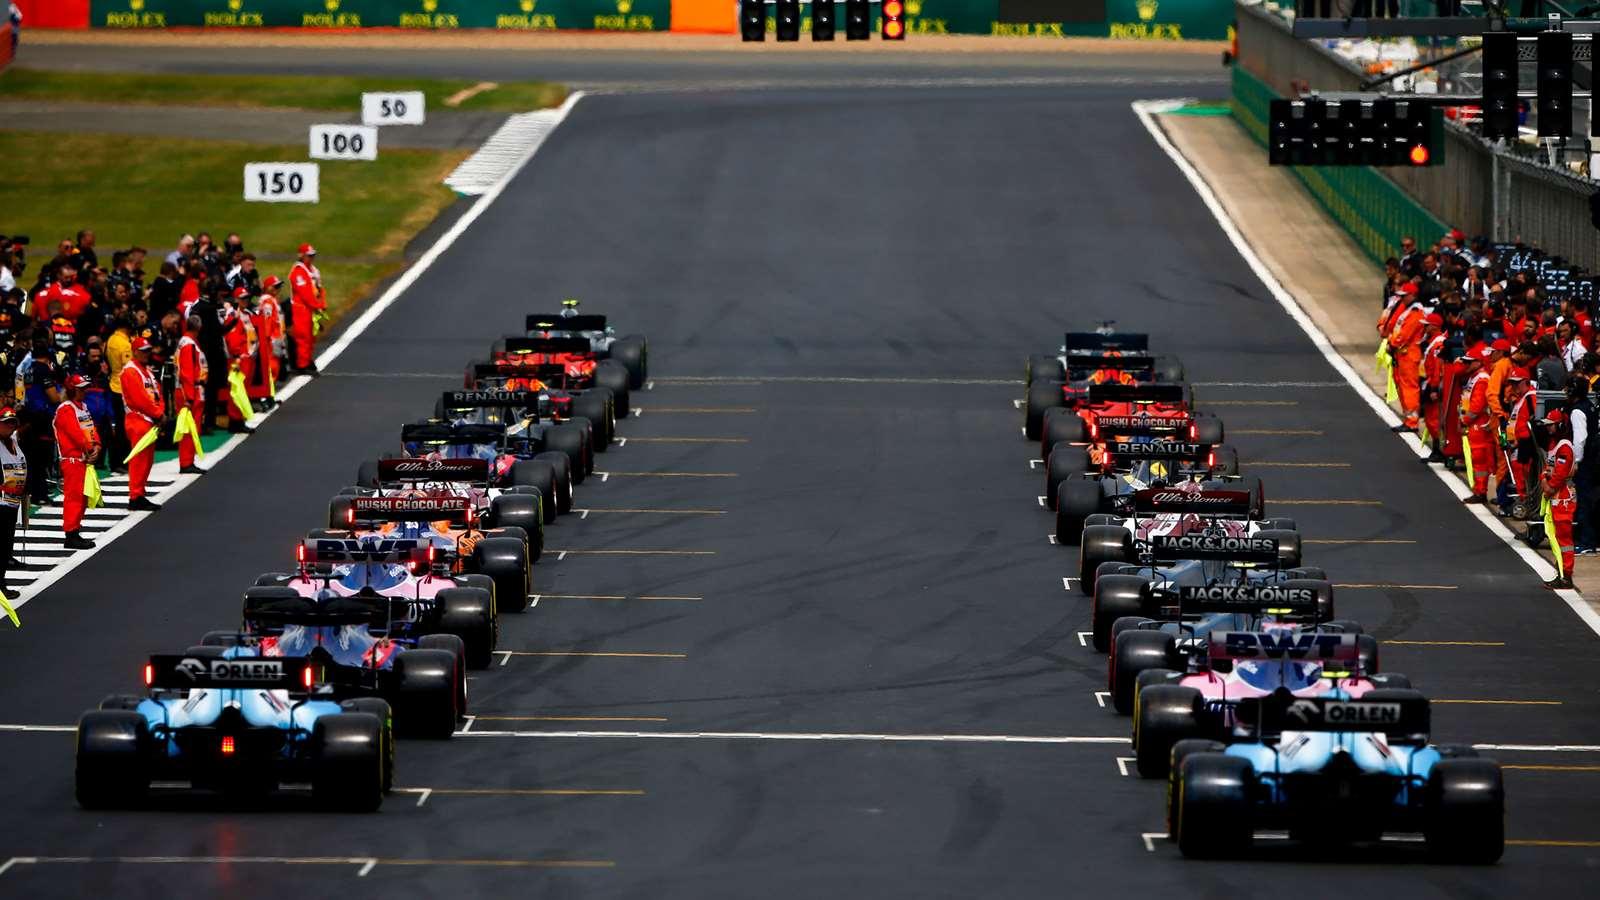 I 10 Migliori Piloti di Formula 1